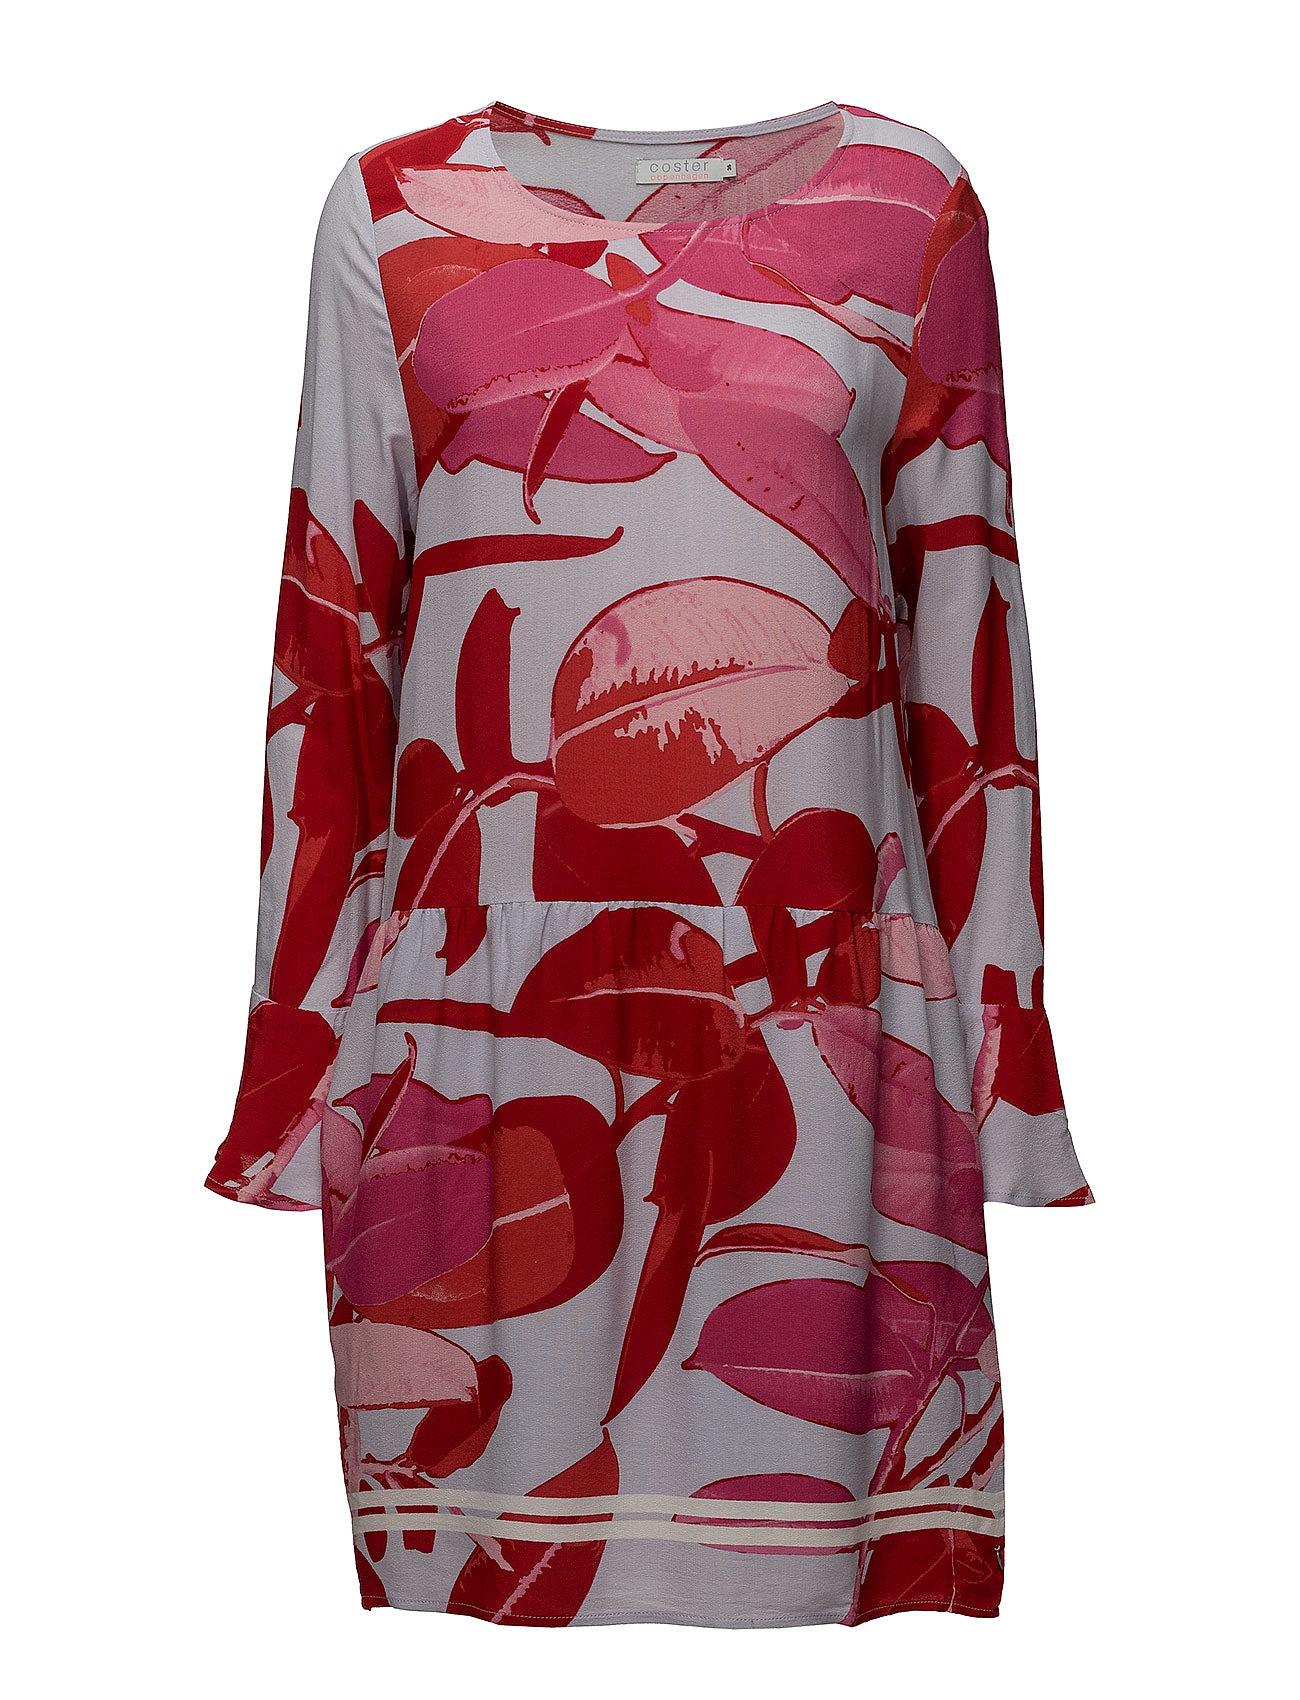 Moss Crepe Dress W. Branch Print & - Coster Copenhagen